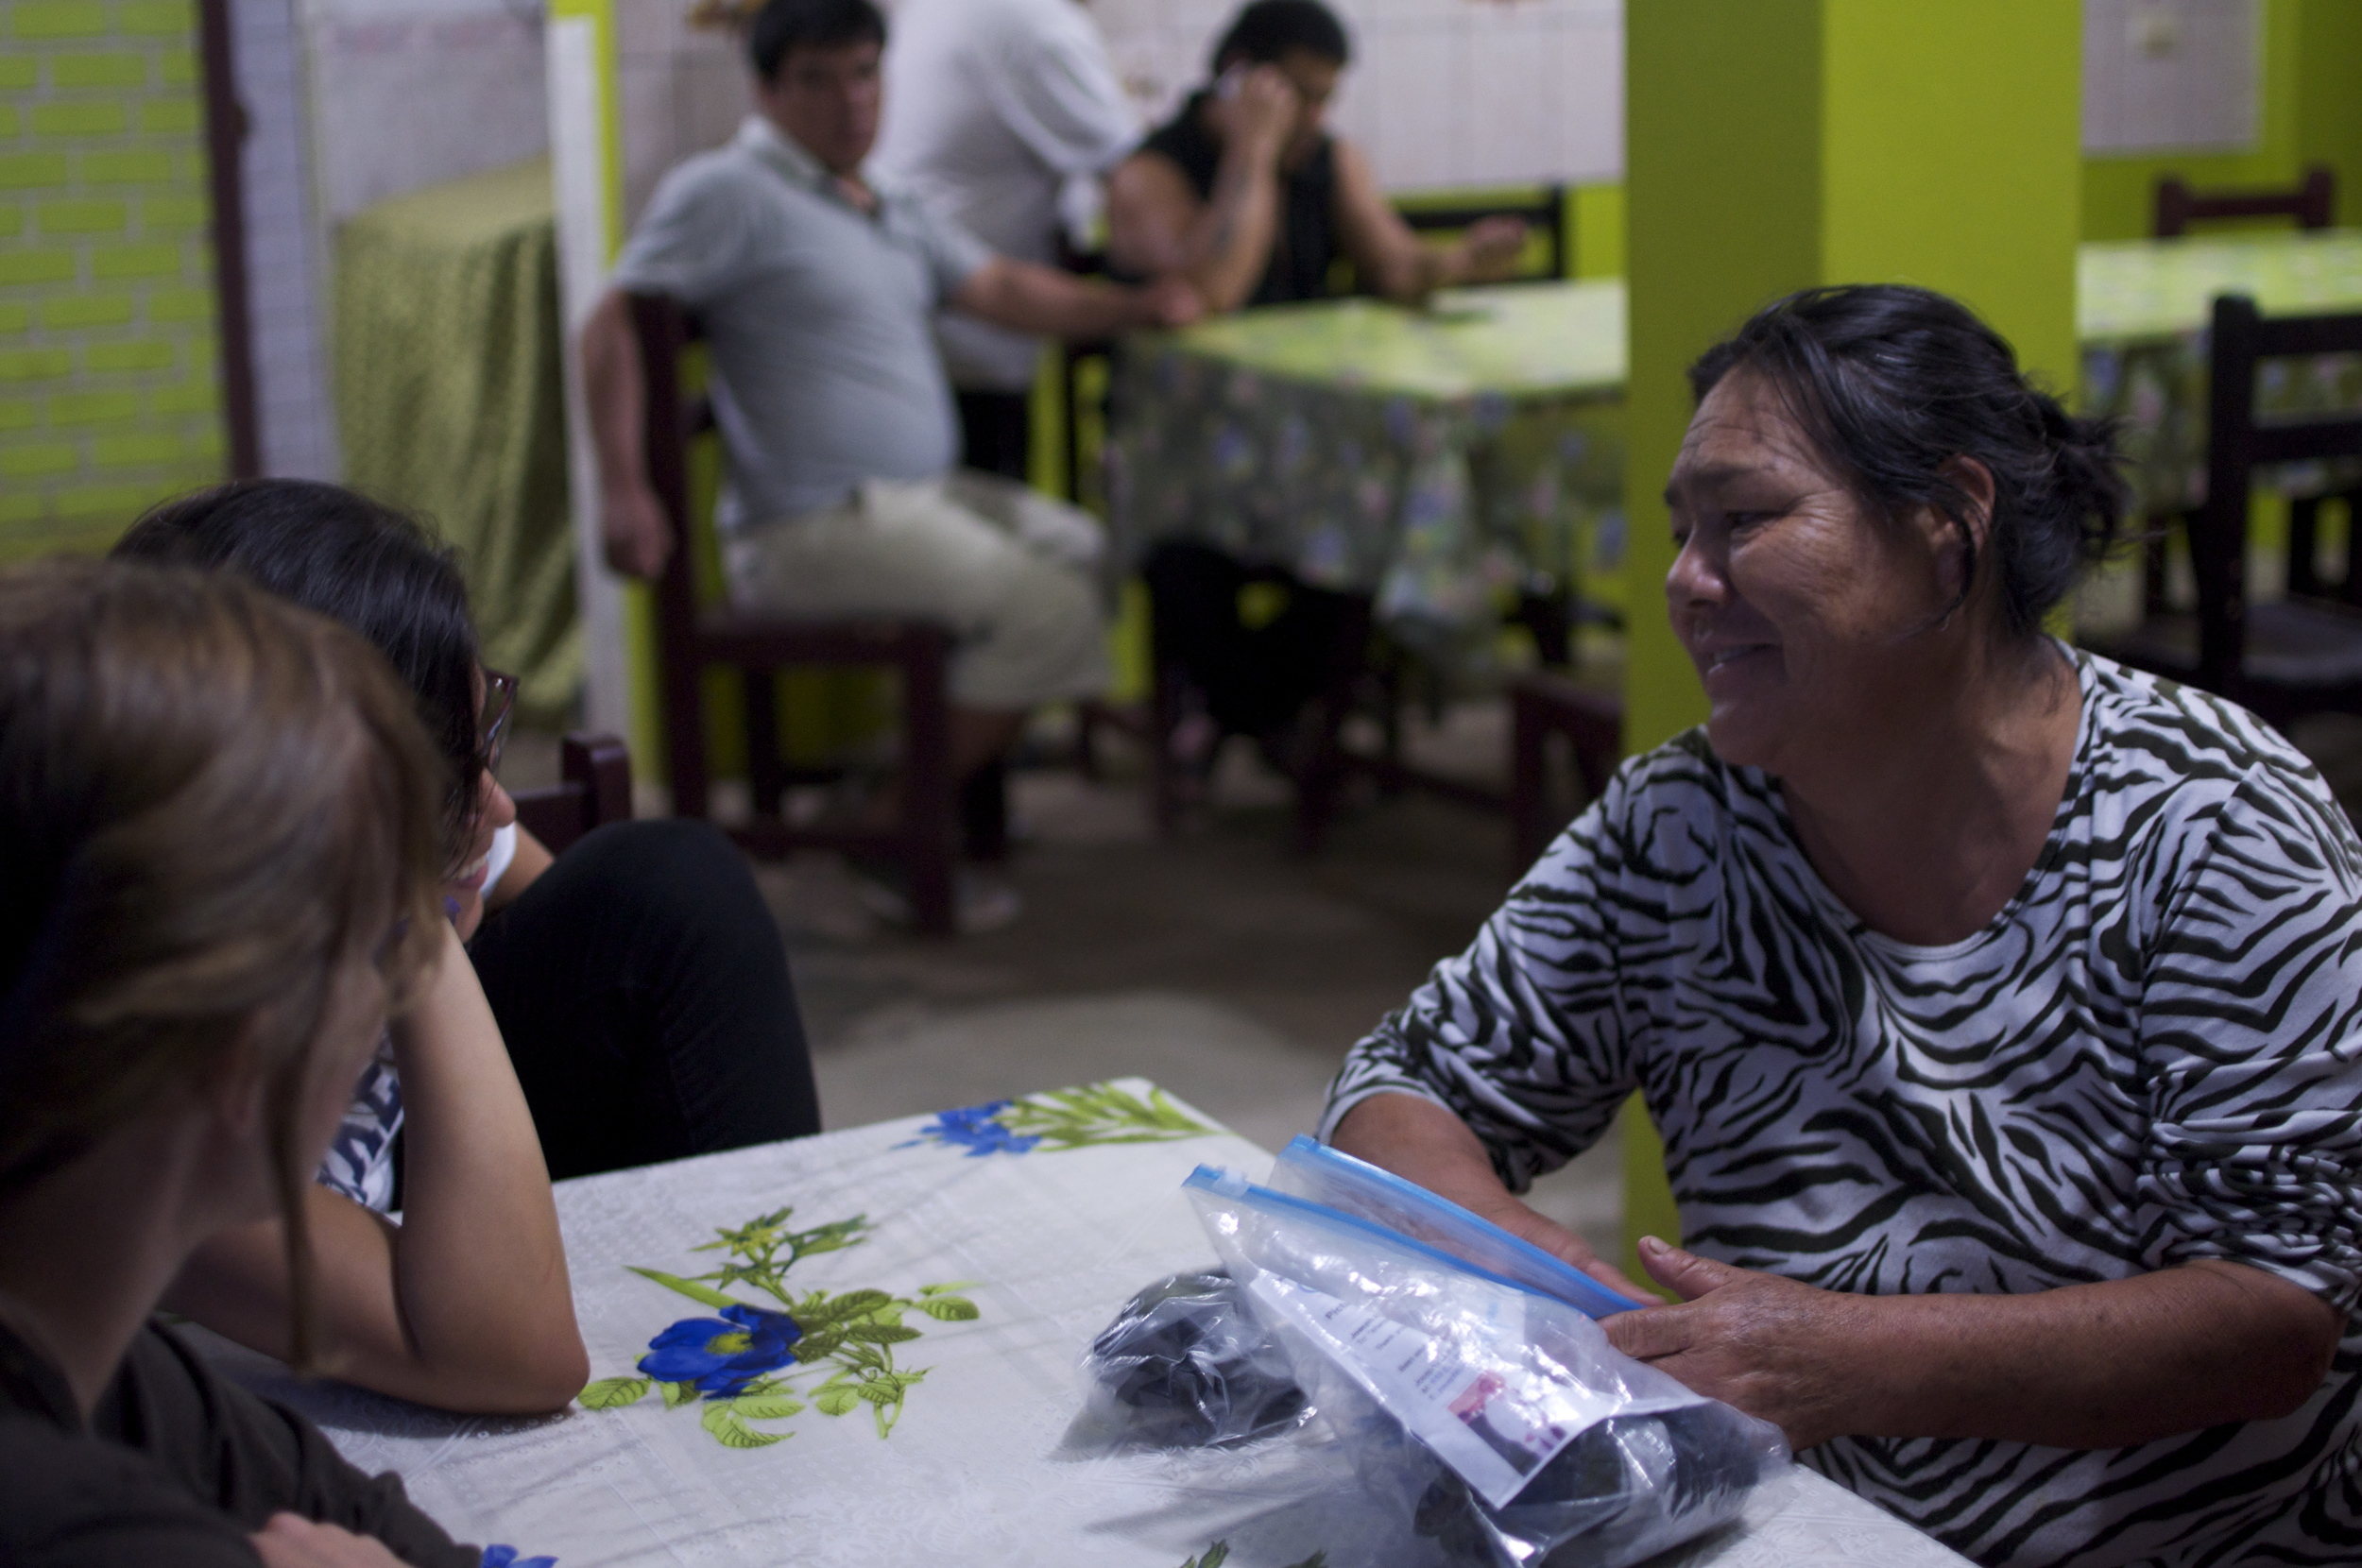 June 2014 - Julia Calderón de Avila chatting with her patients before a healing ceremony.